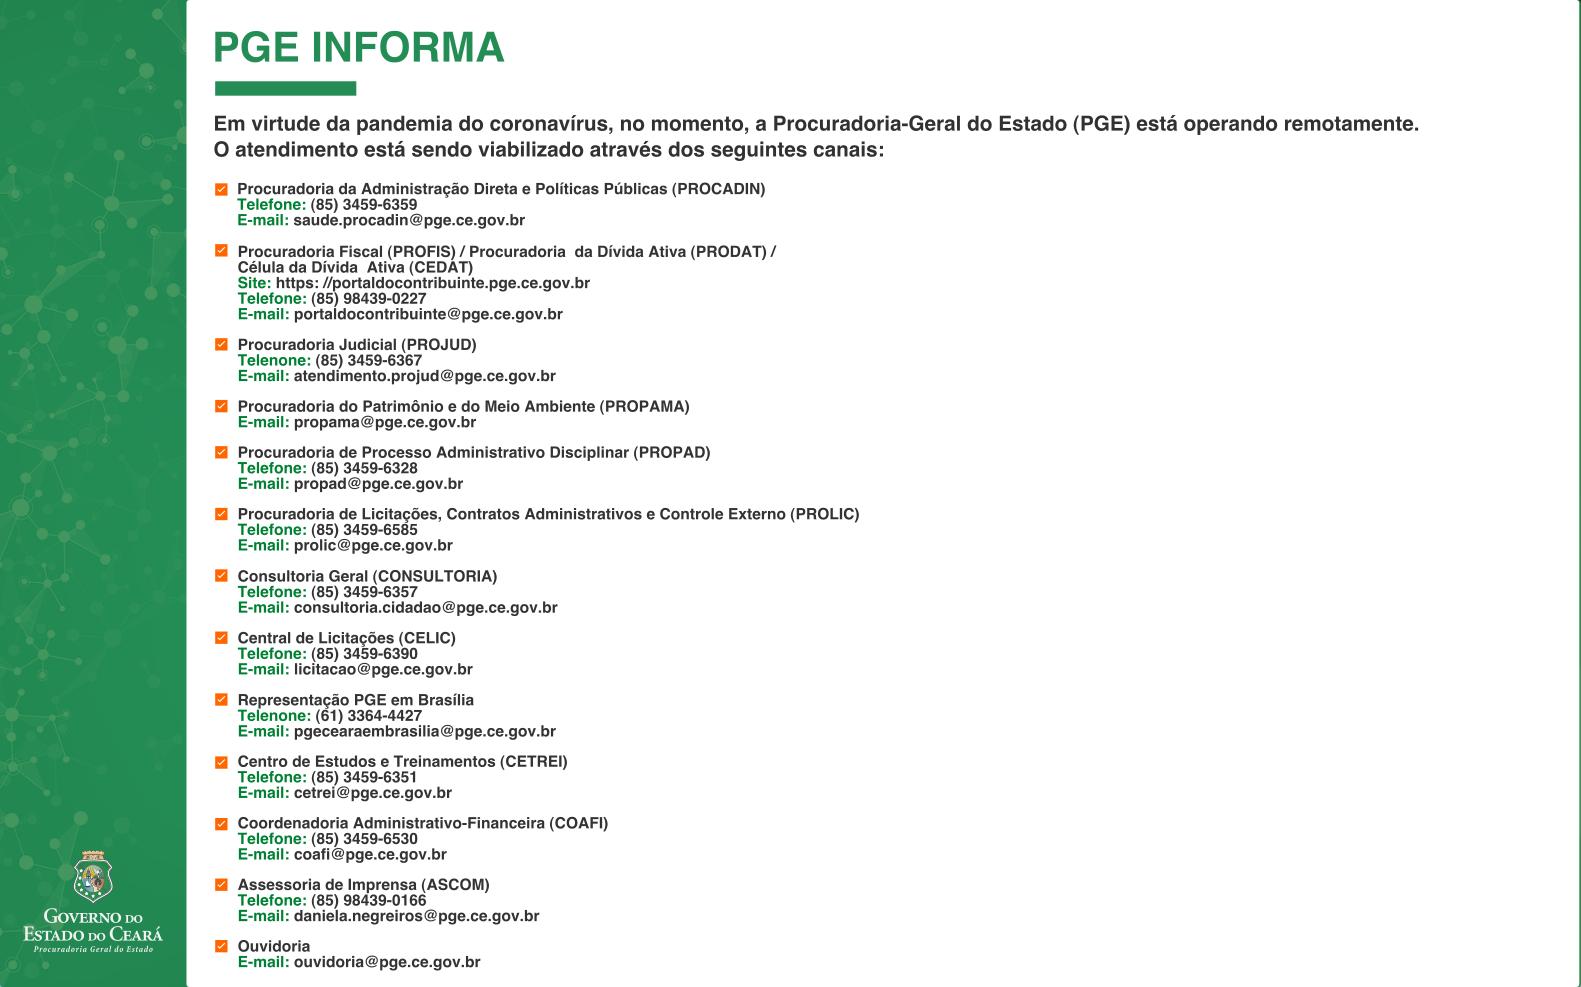 PGE Informa